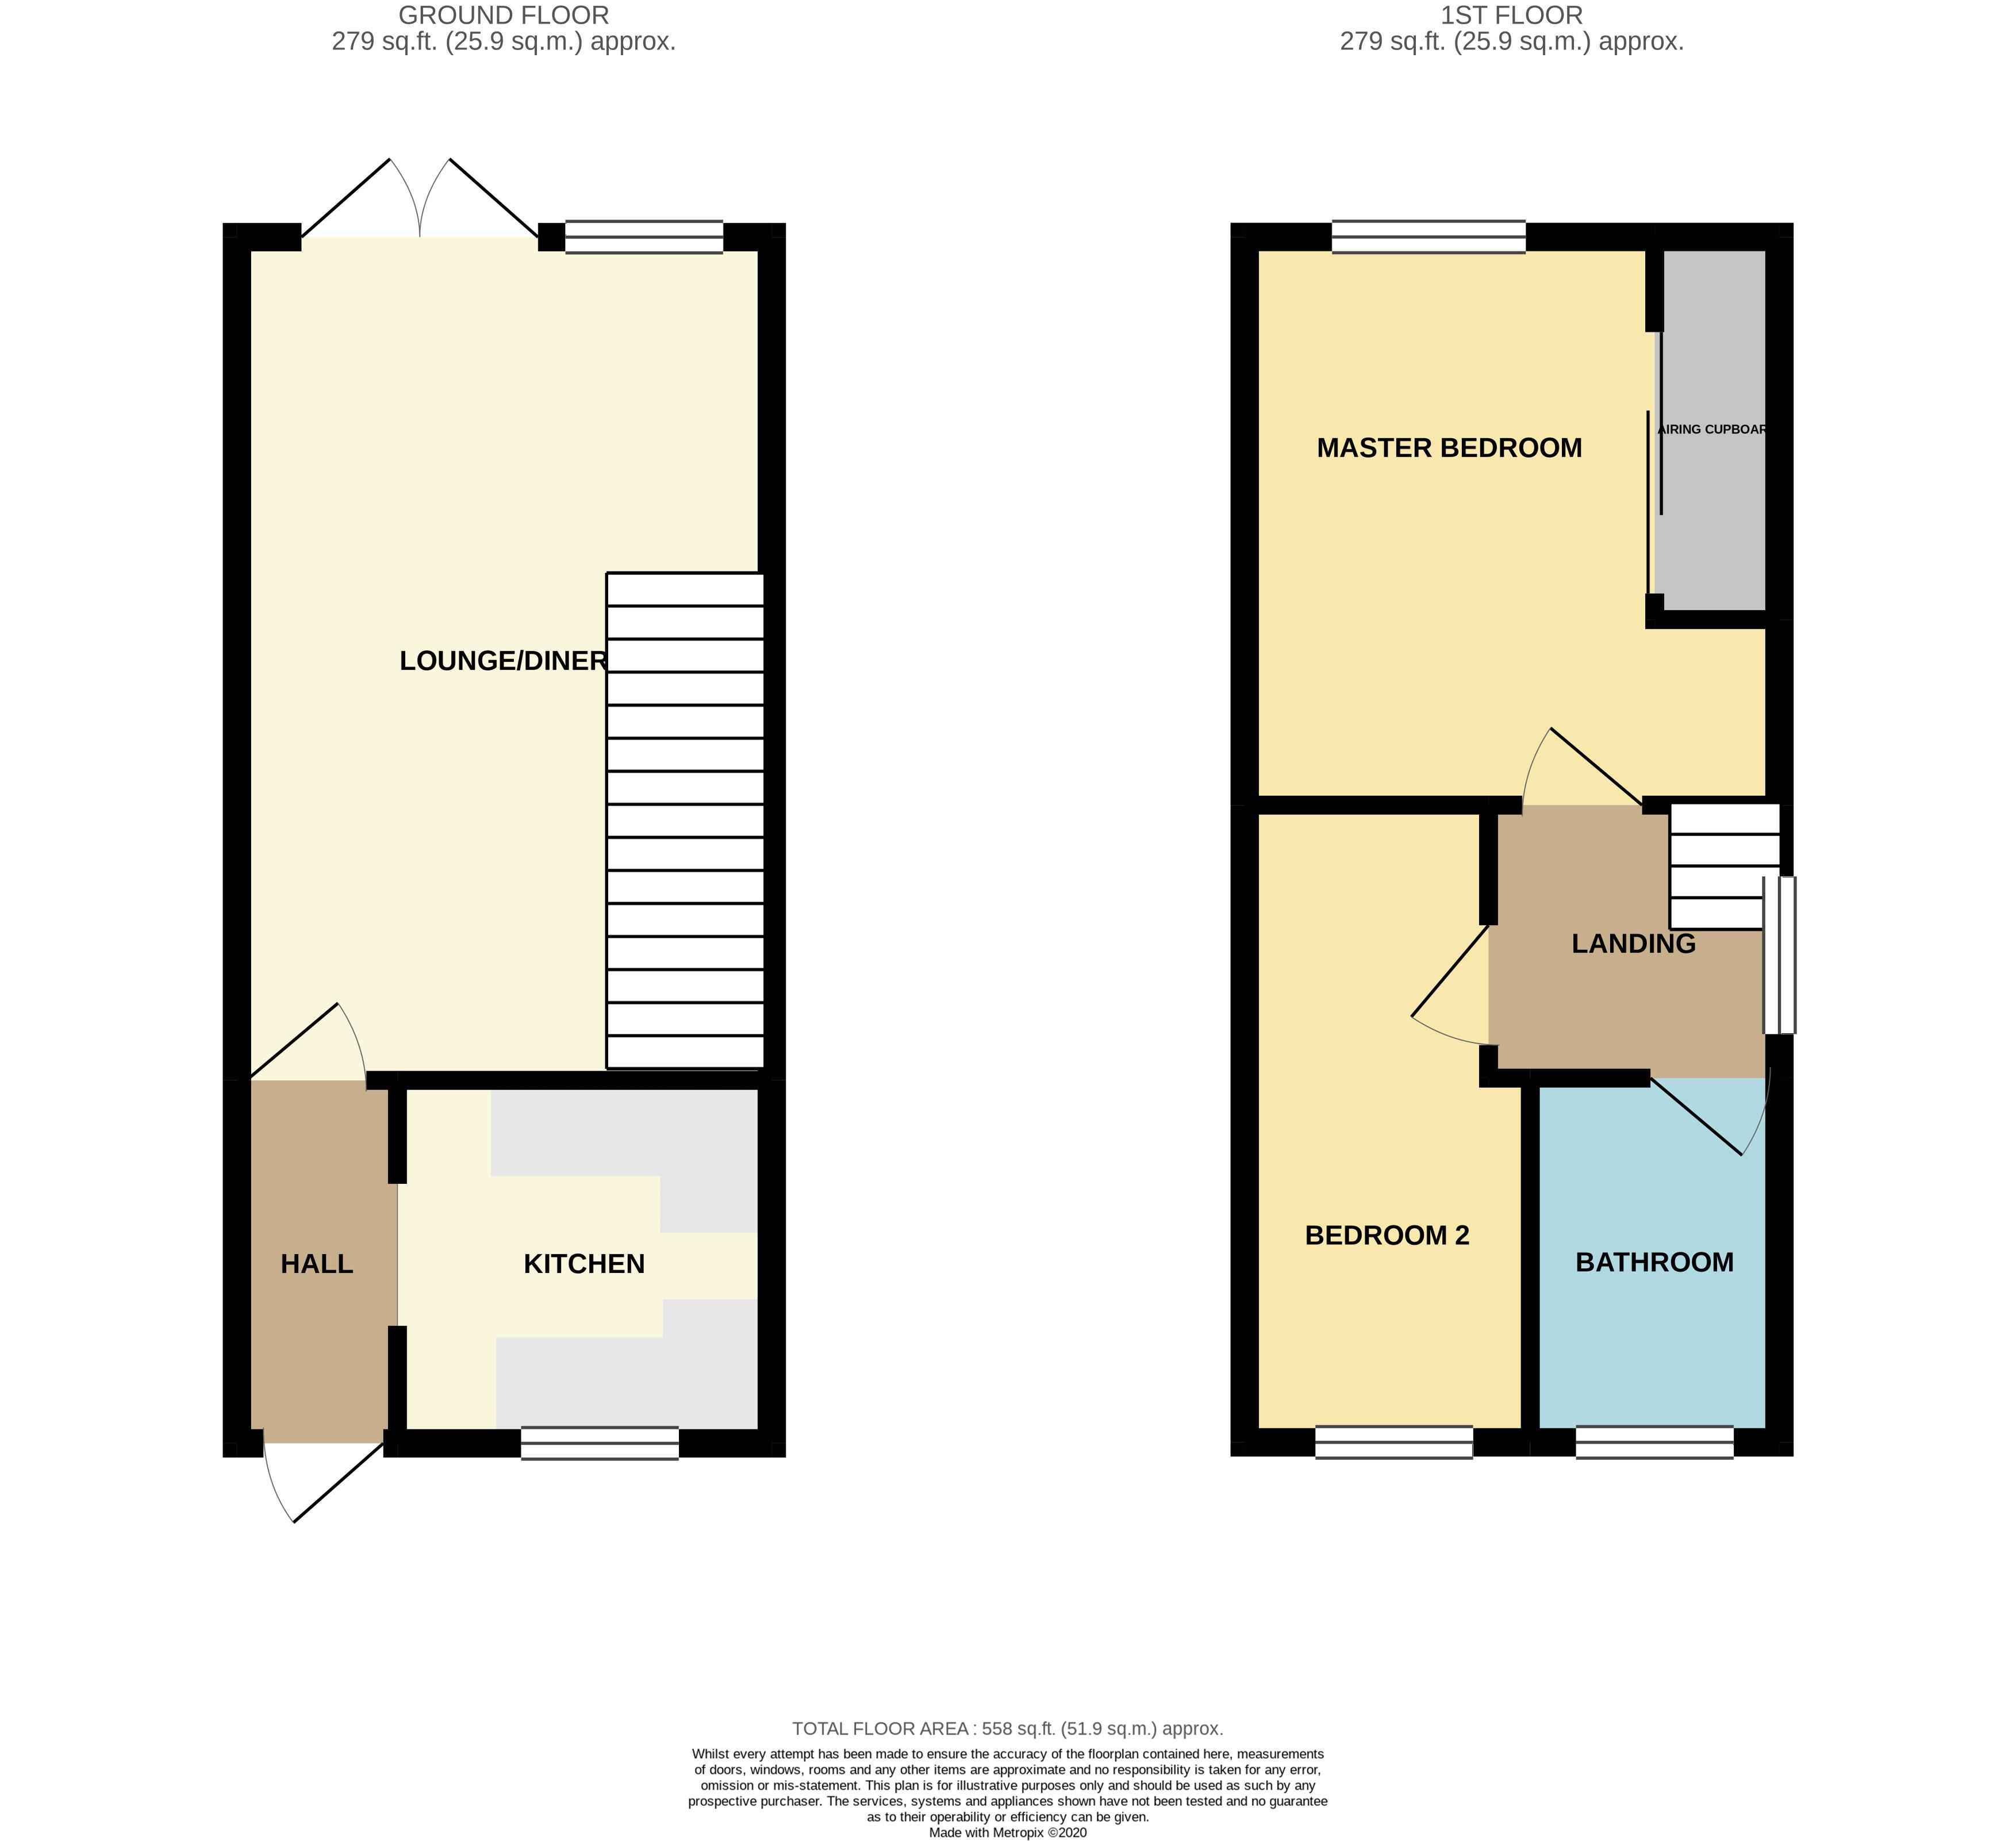 Floorplan for Parnall Crescent, Yate.